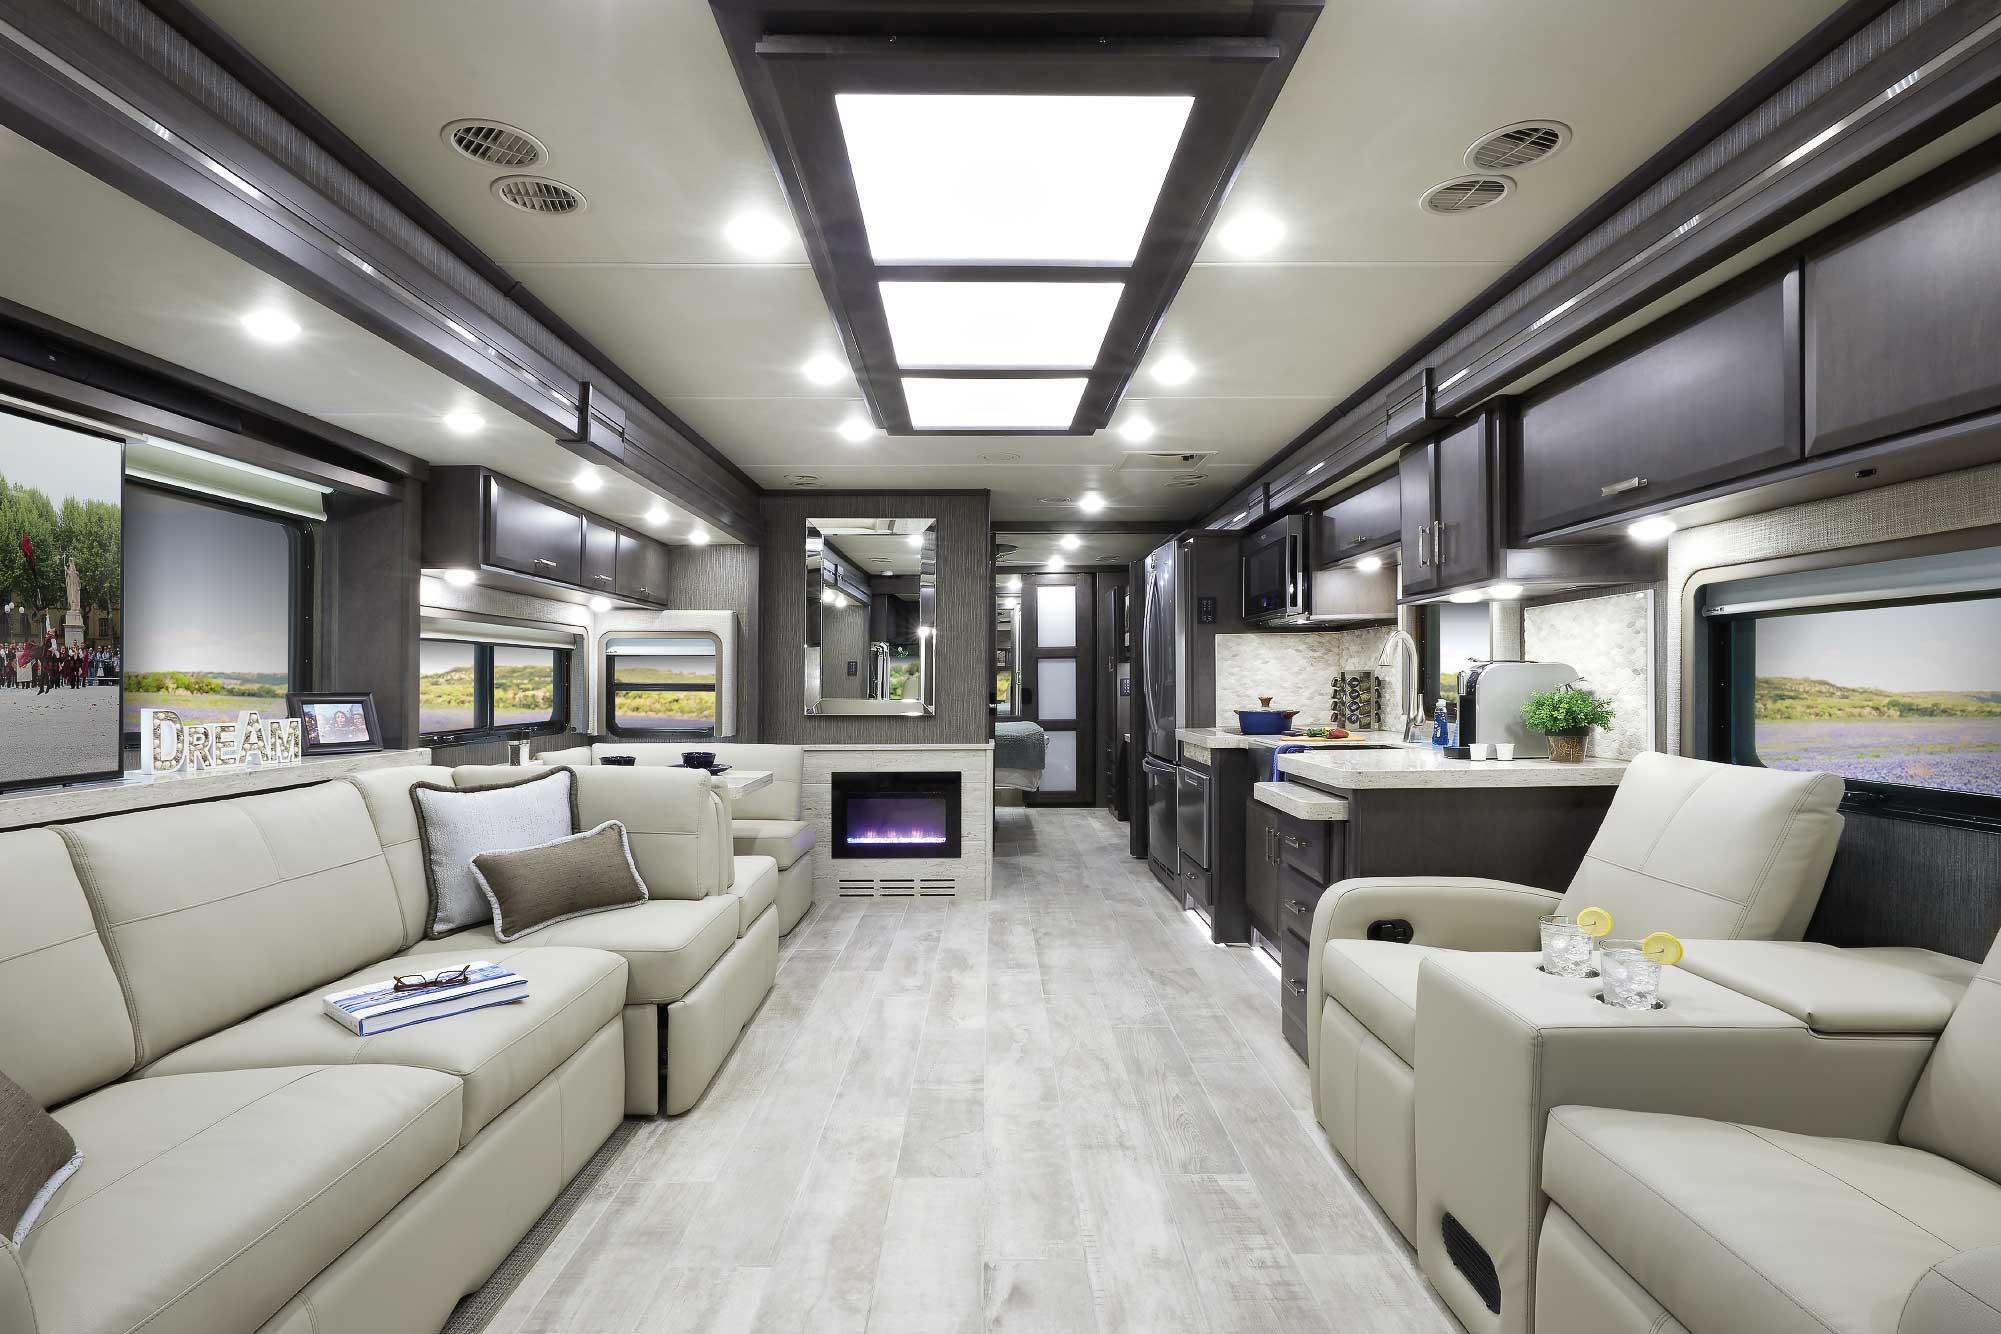 tuscany class a diesel rv interior